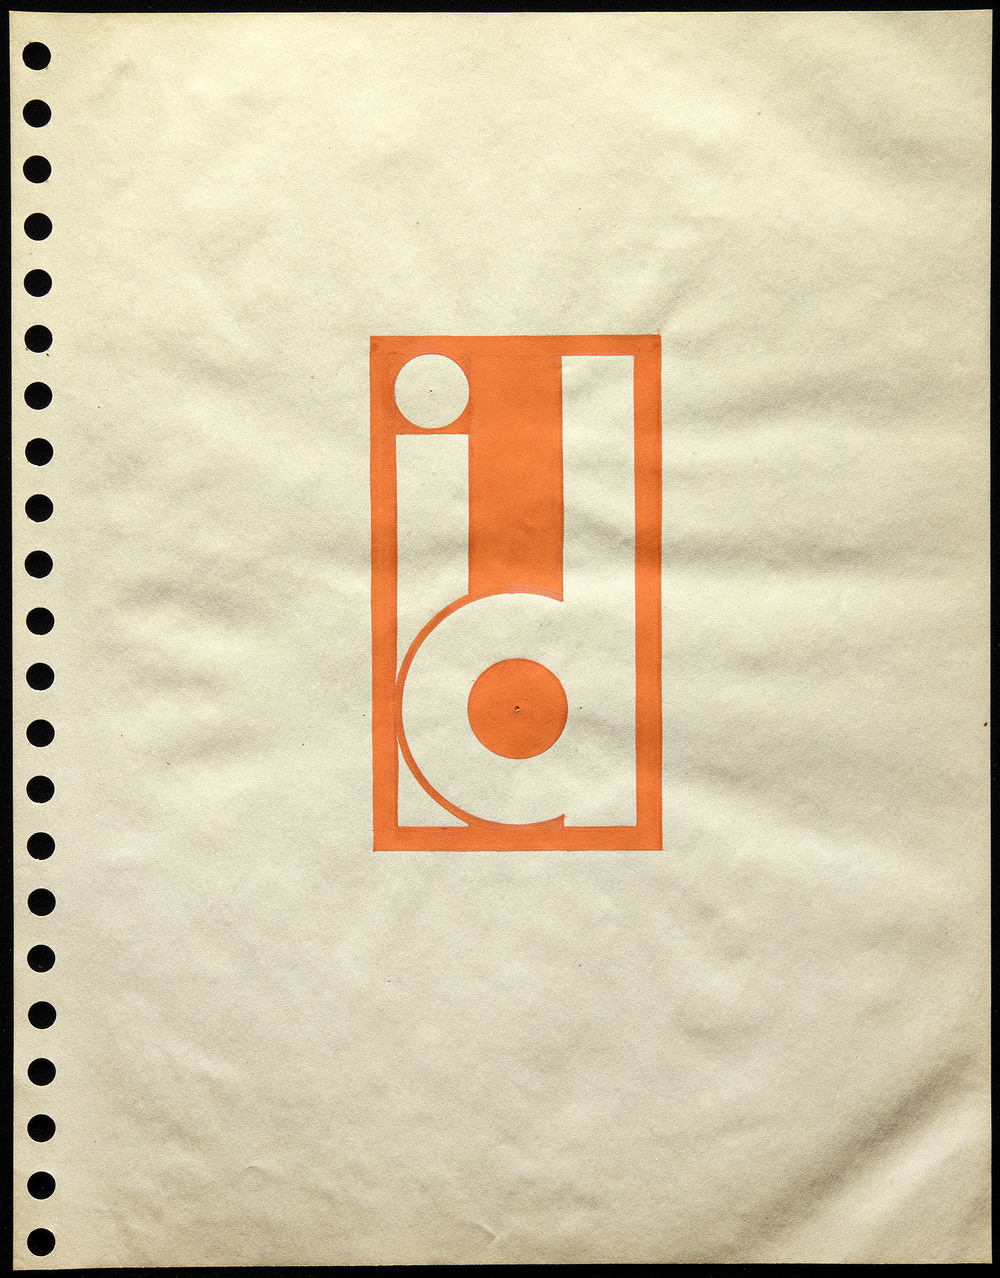 Walter Huxley, sketch for logotype, New York, circa 1935, 22 x 28.5 cm